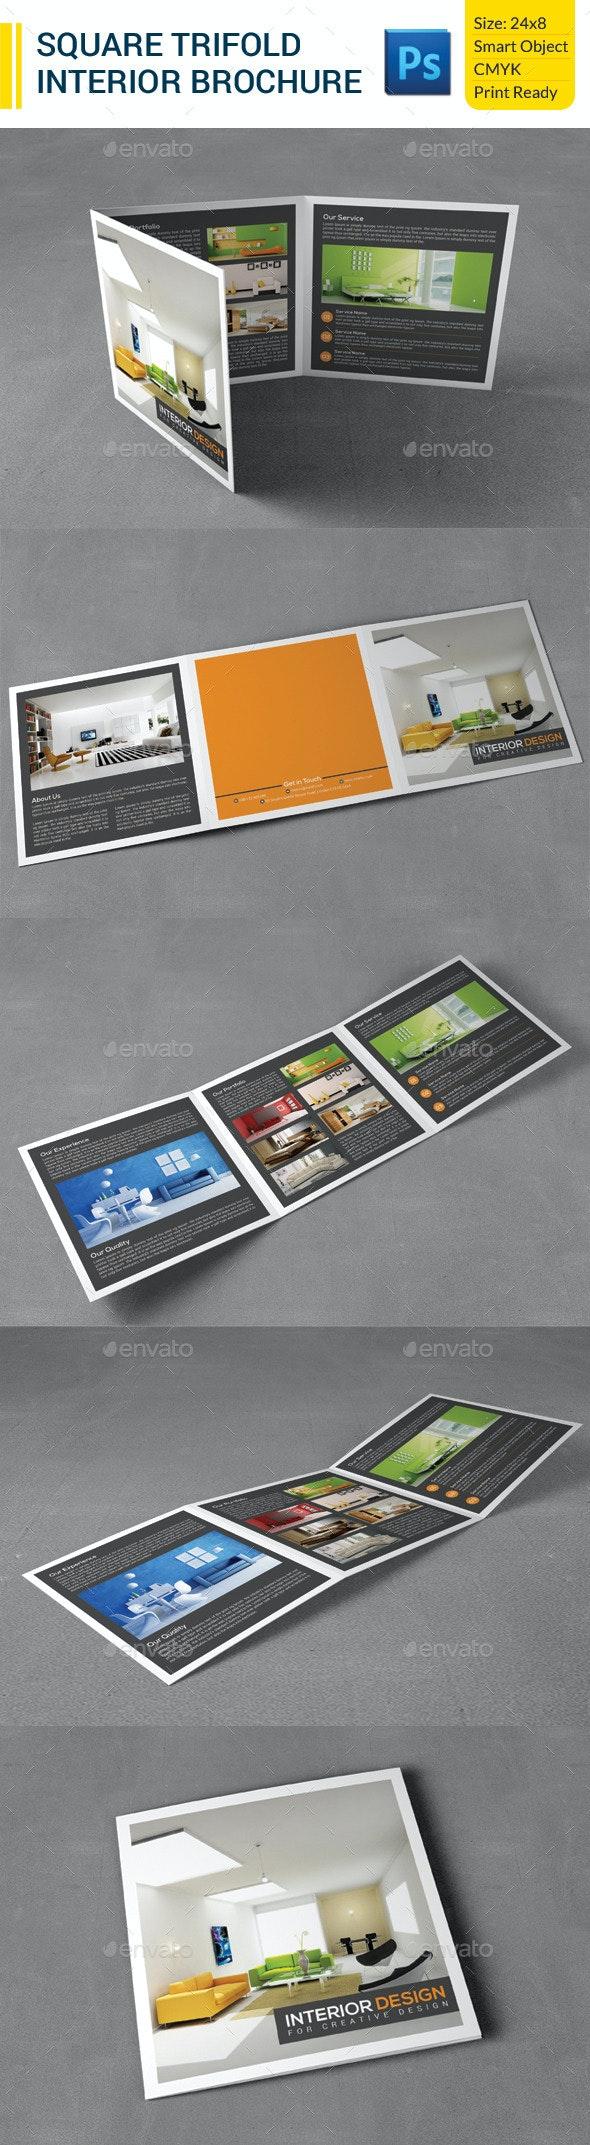 Square Trifold Interior Brochure - Corporate Brochures